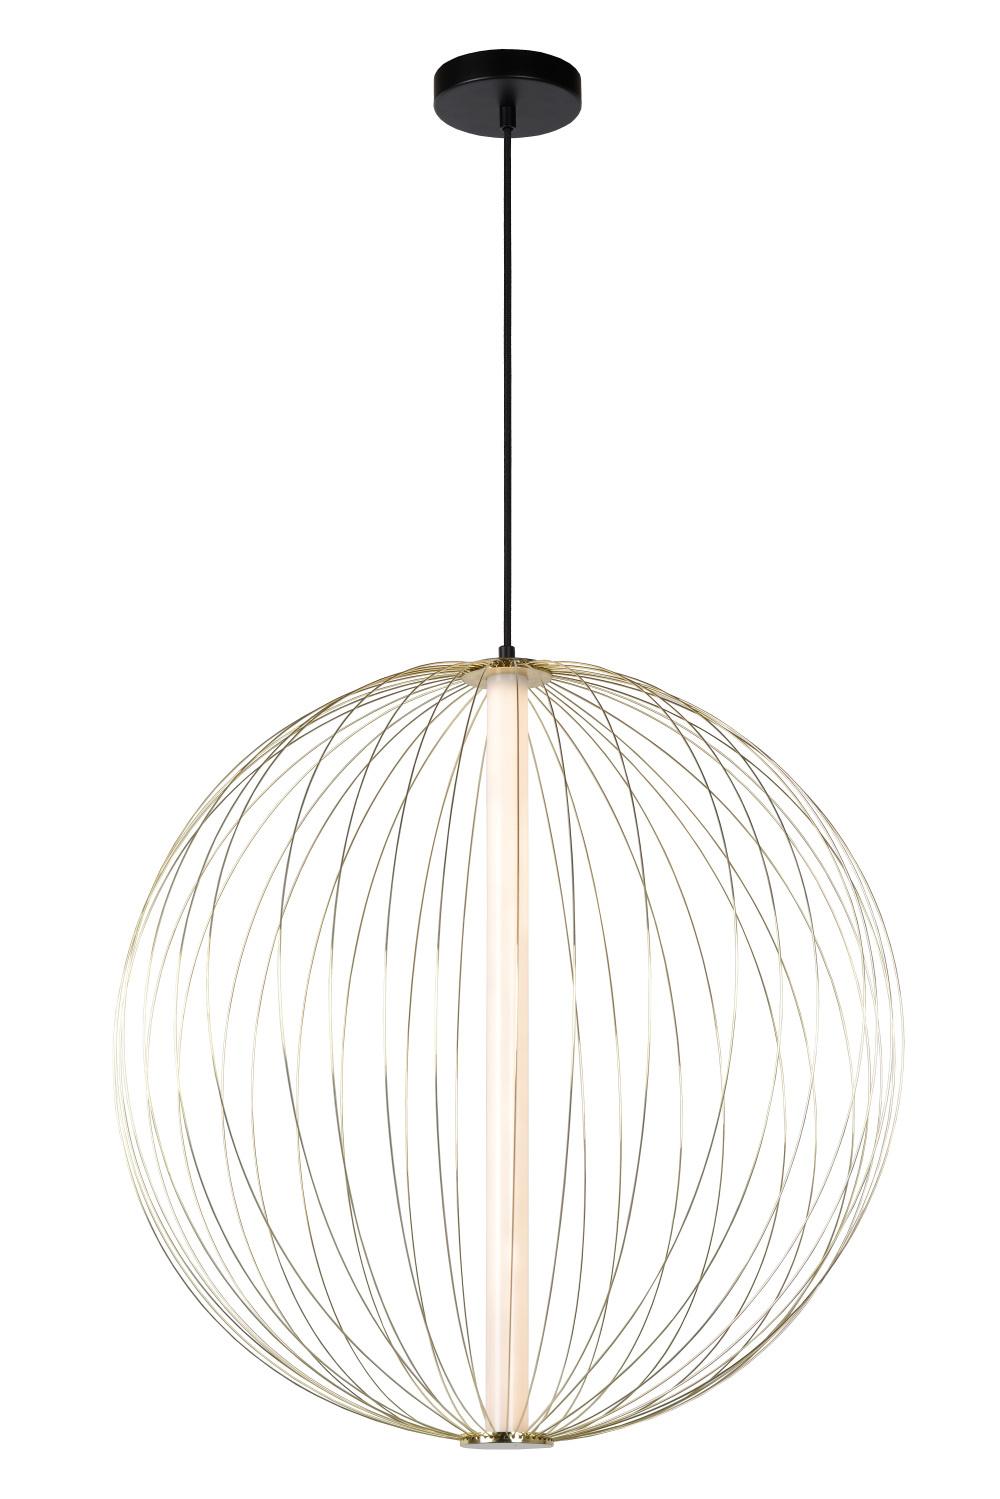 Lucide CARBONY Hanglamp-Mat Go.-Ø60-LED Dimb.-10W-2700K